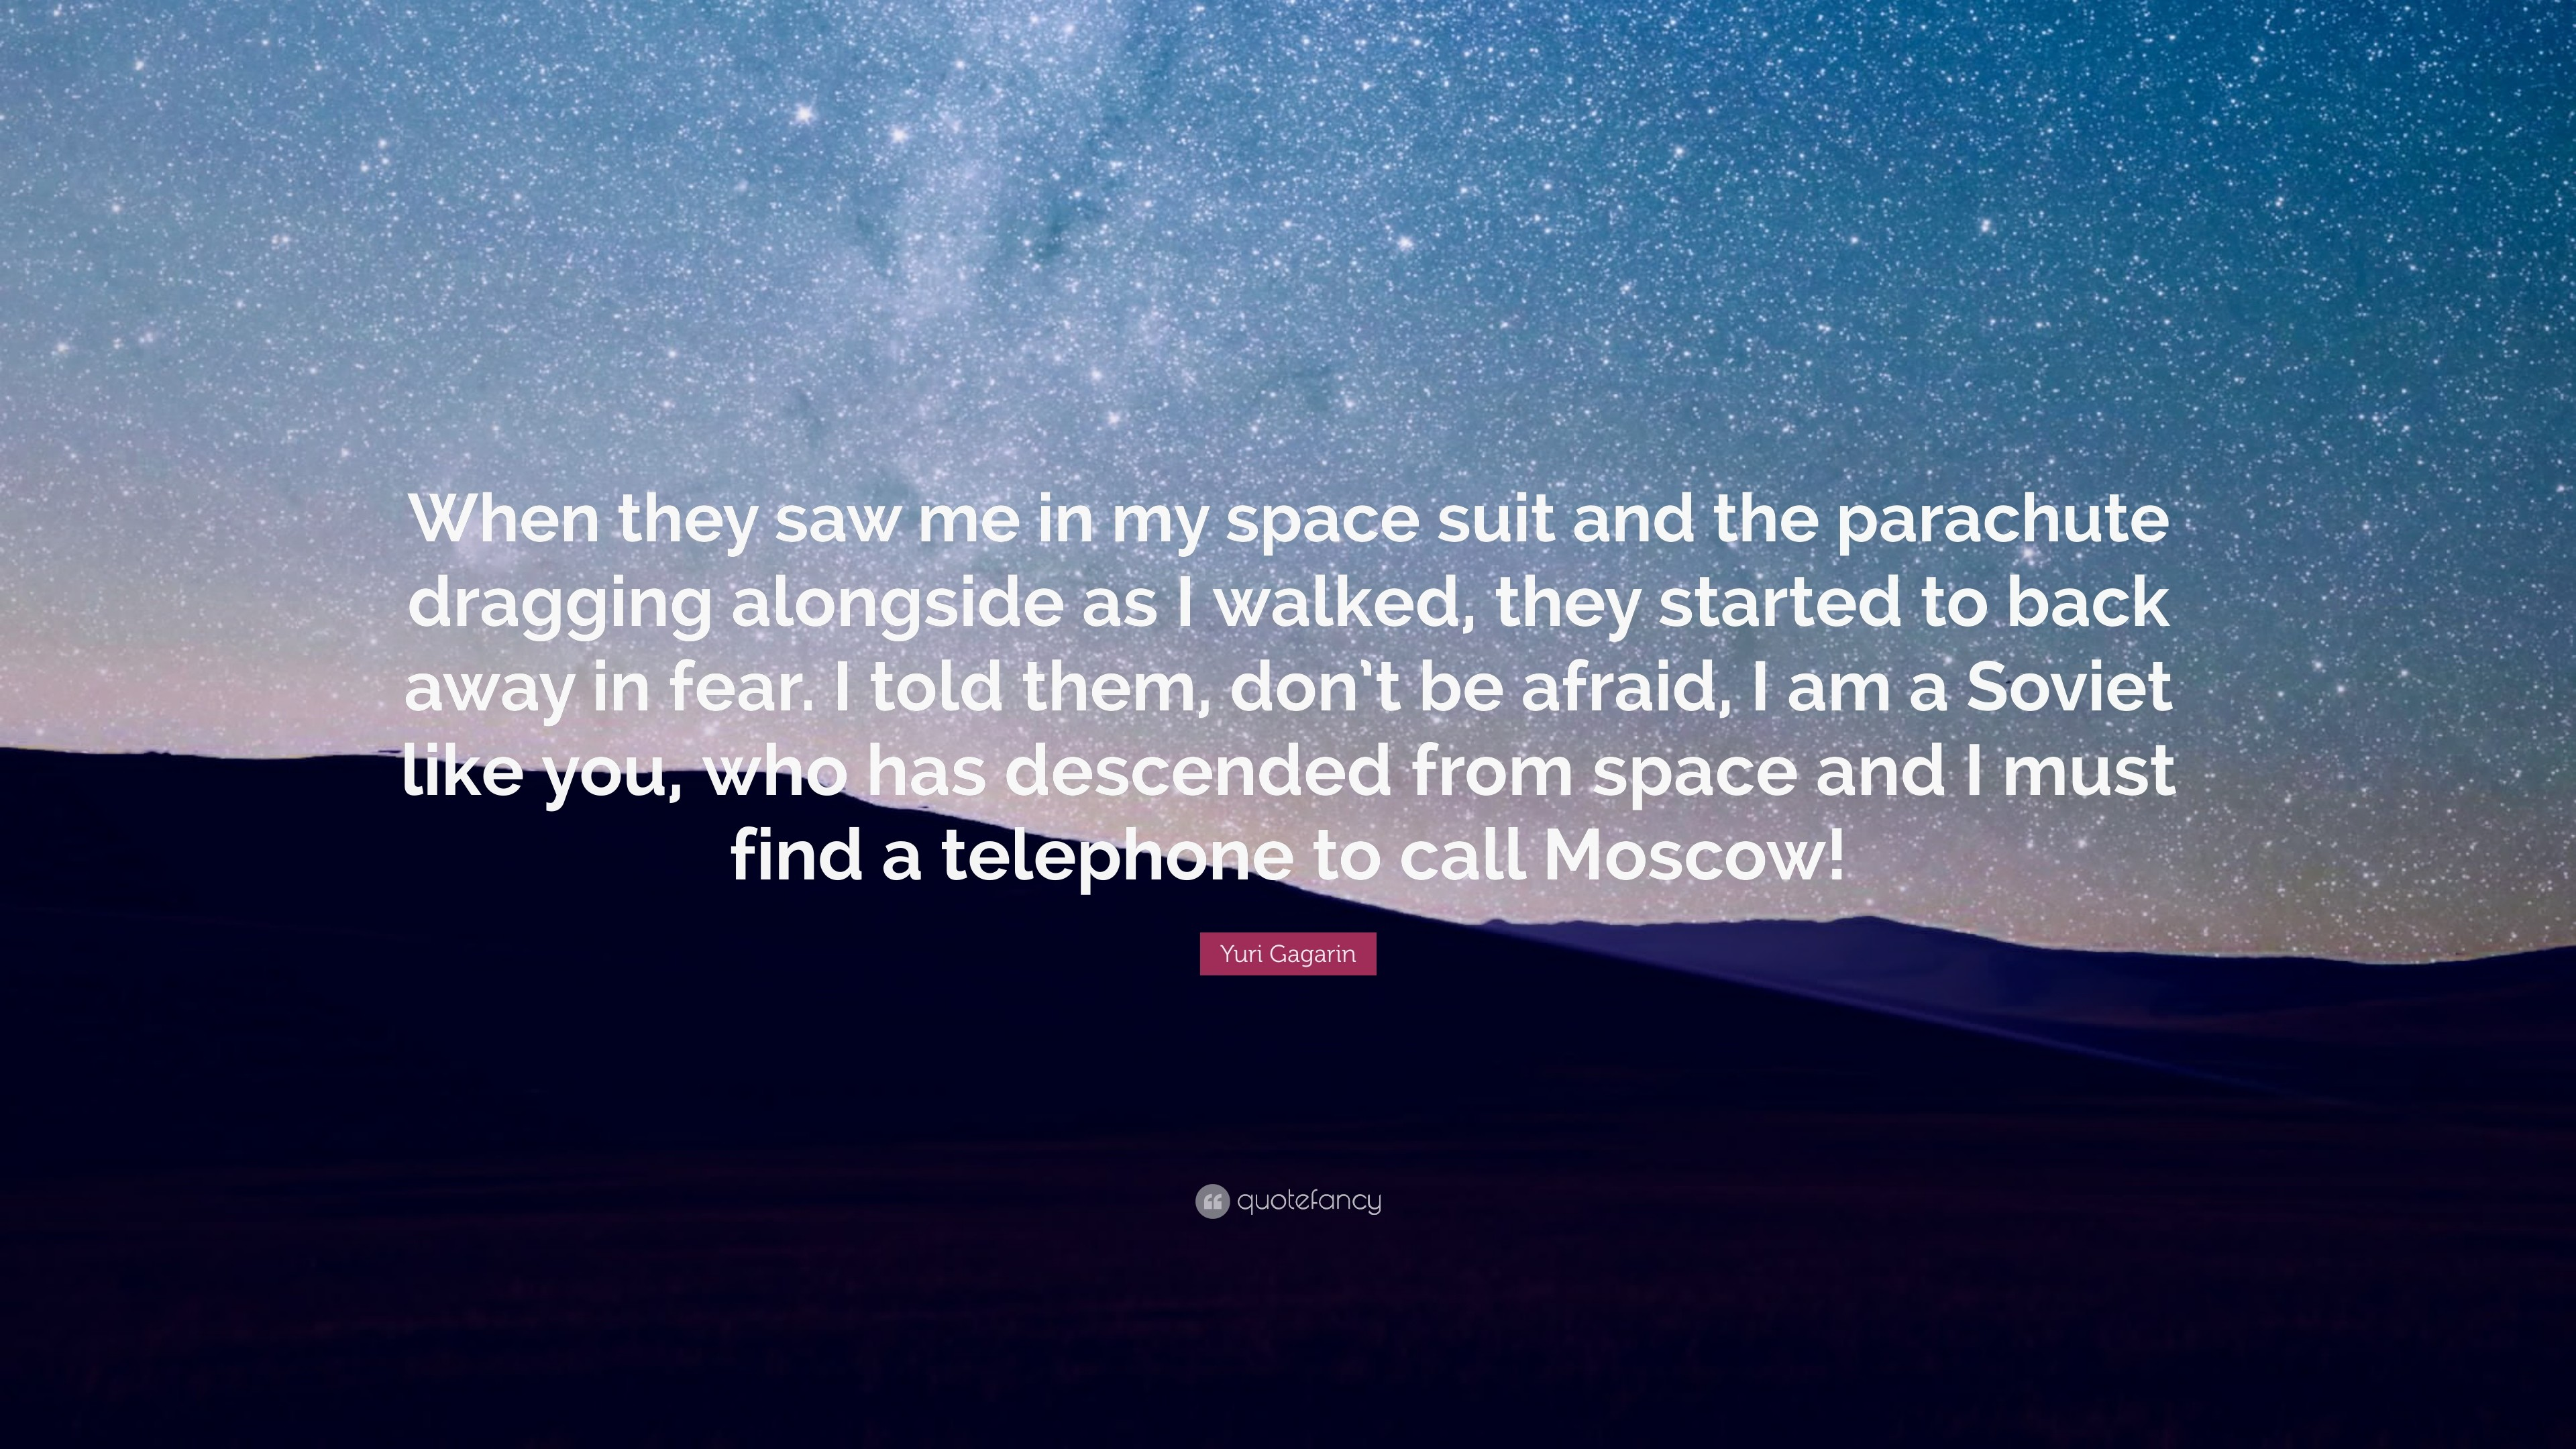 Yuri Gagarin Quotes Wallpaper Yuri Gagarin Wallpaper 79 Images